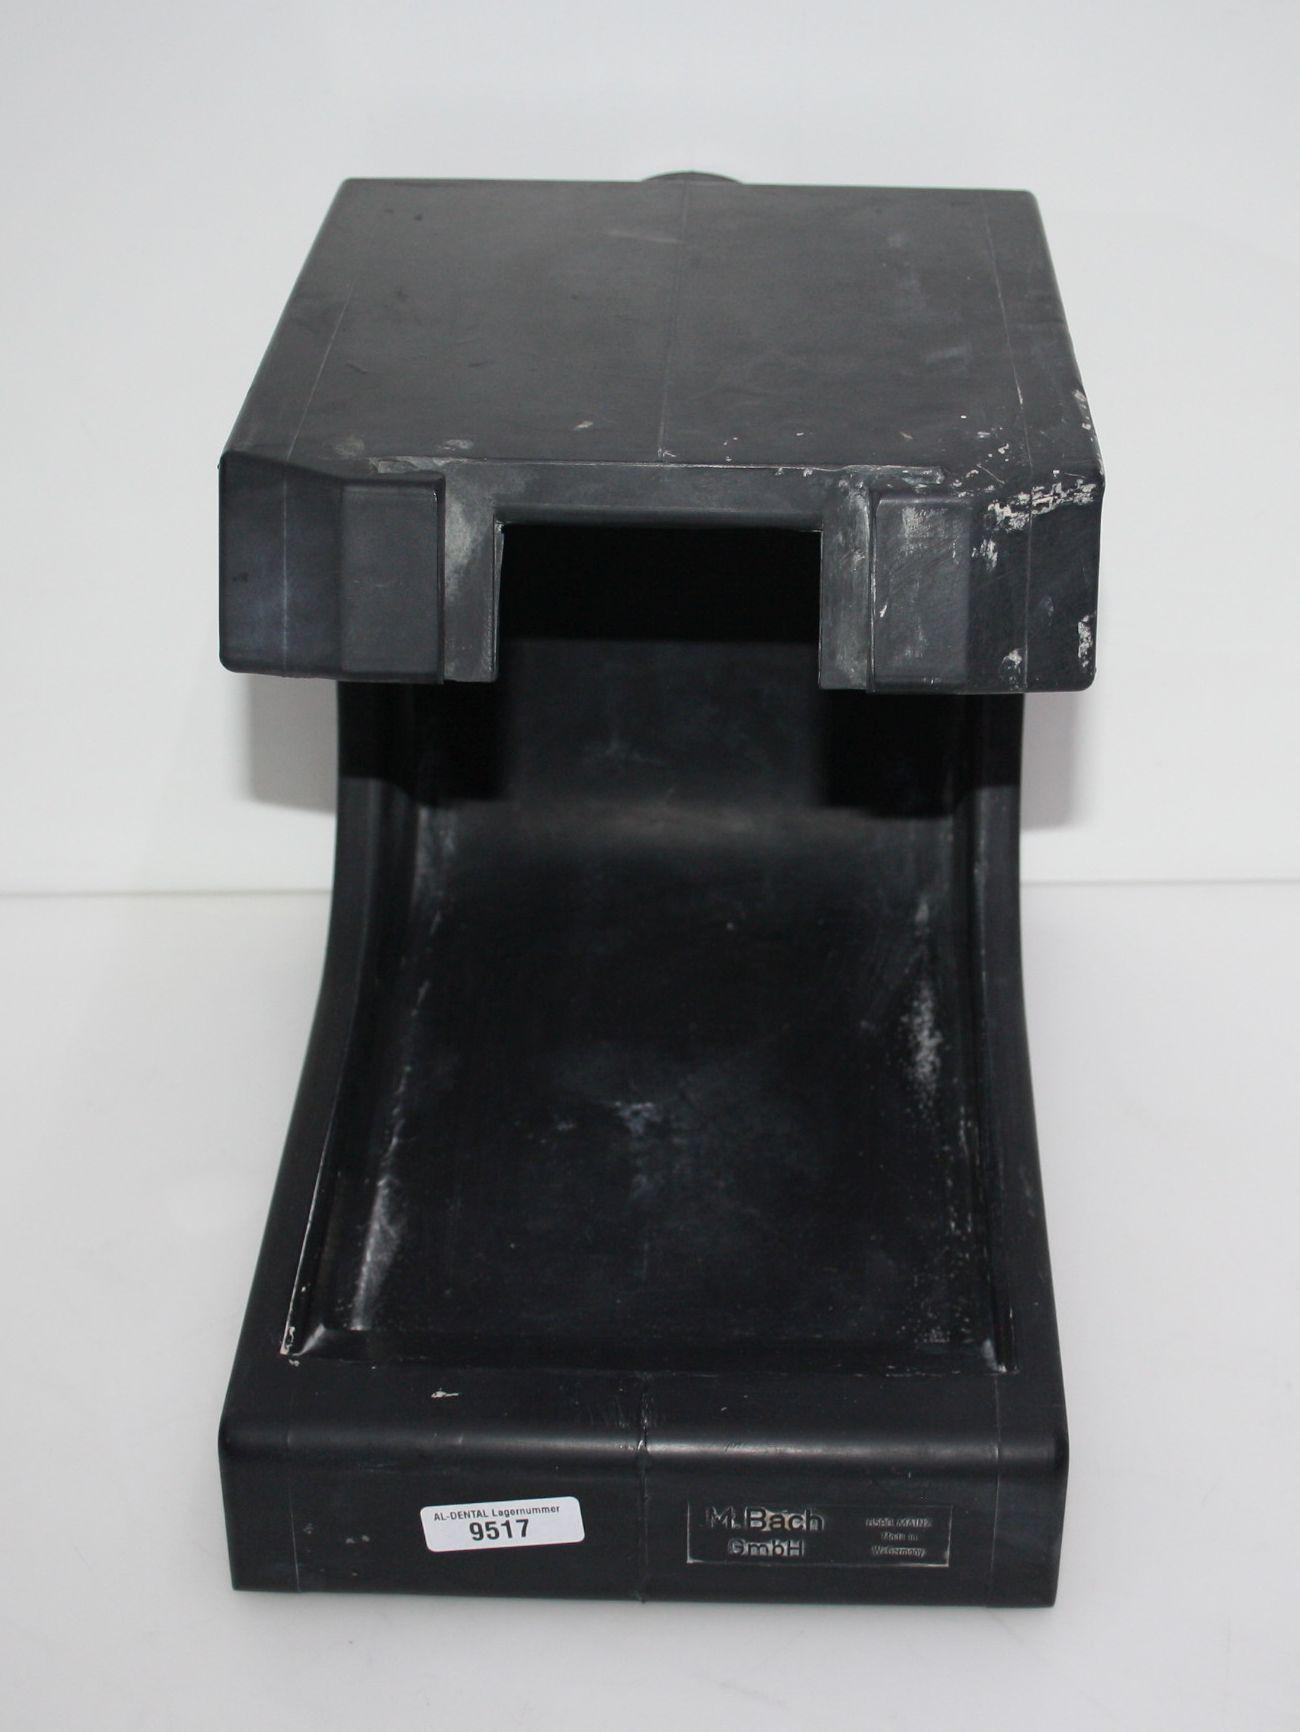 KaVo K 9 Handstück Typ 950 - neu gelagert # 9547